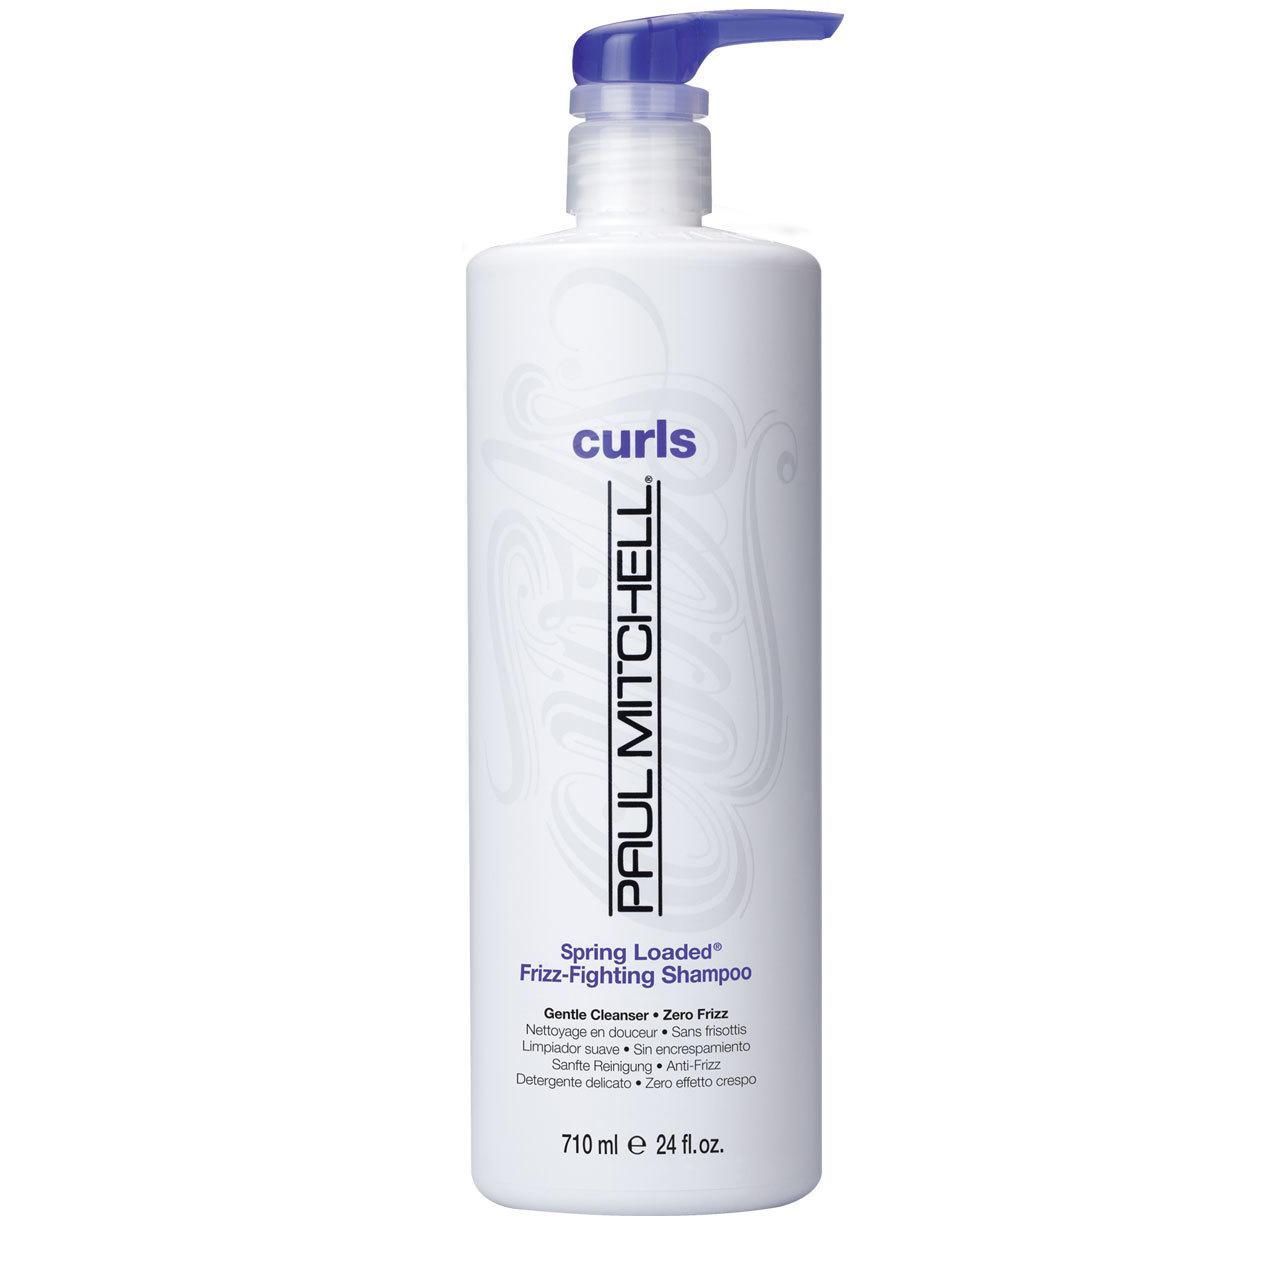 Curls spring loaded detangling shampool